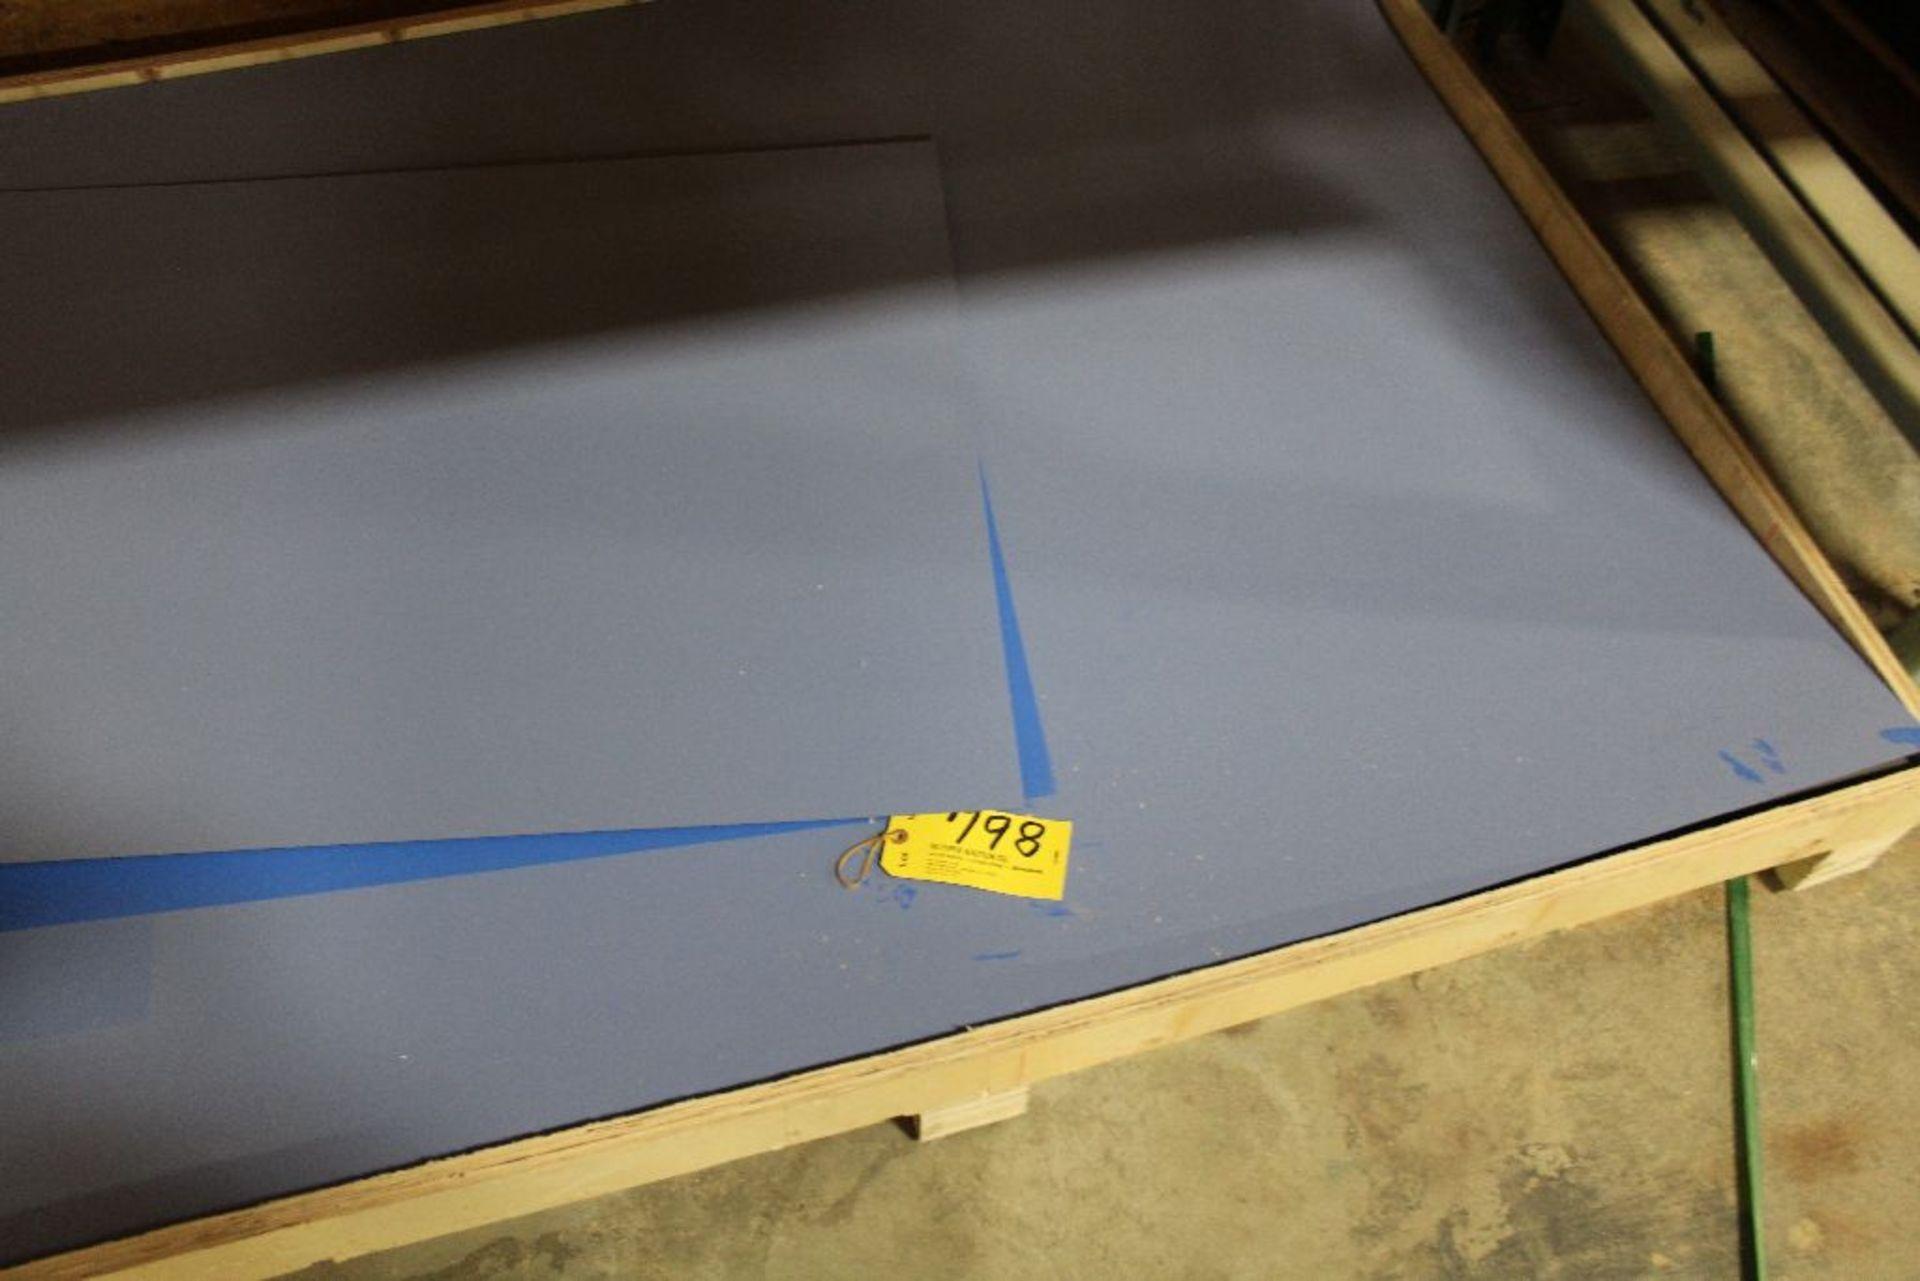 "Lot 798 - Panels, Ploy, Honda blue, 49"" x 97""."